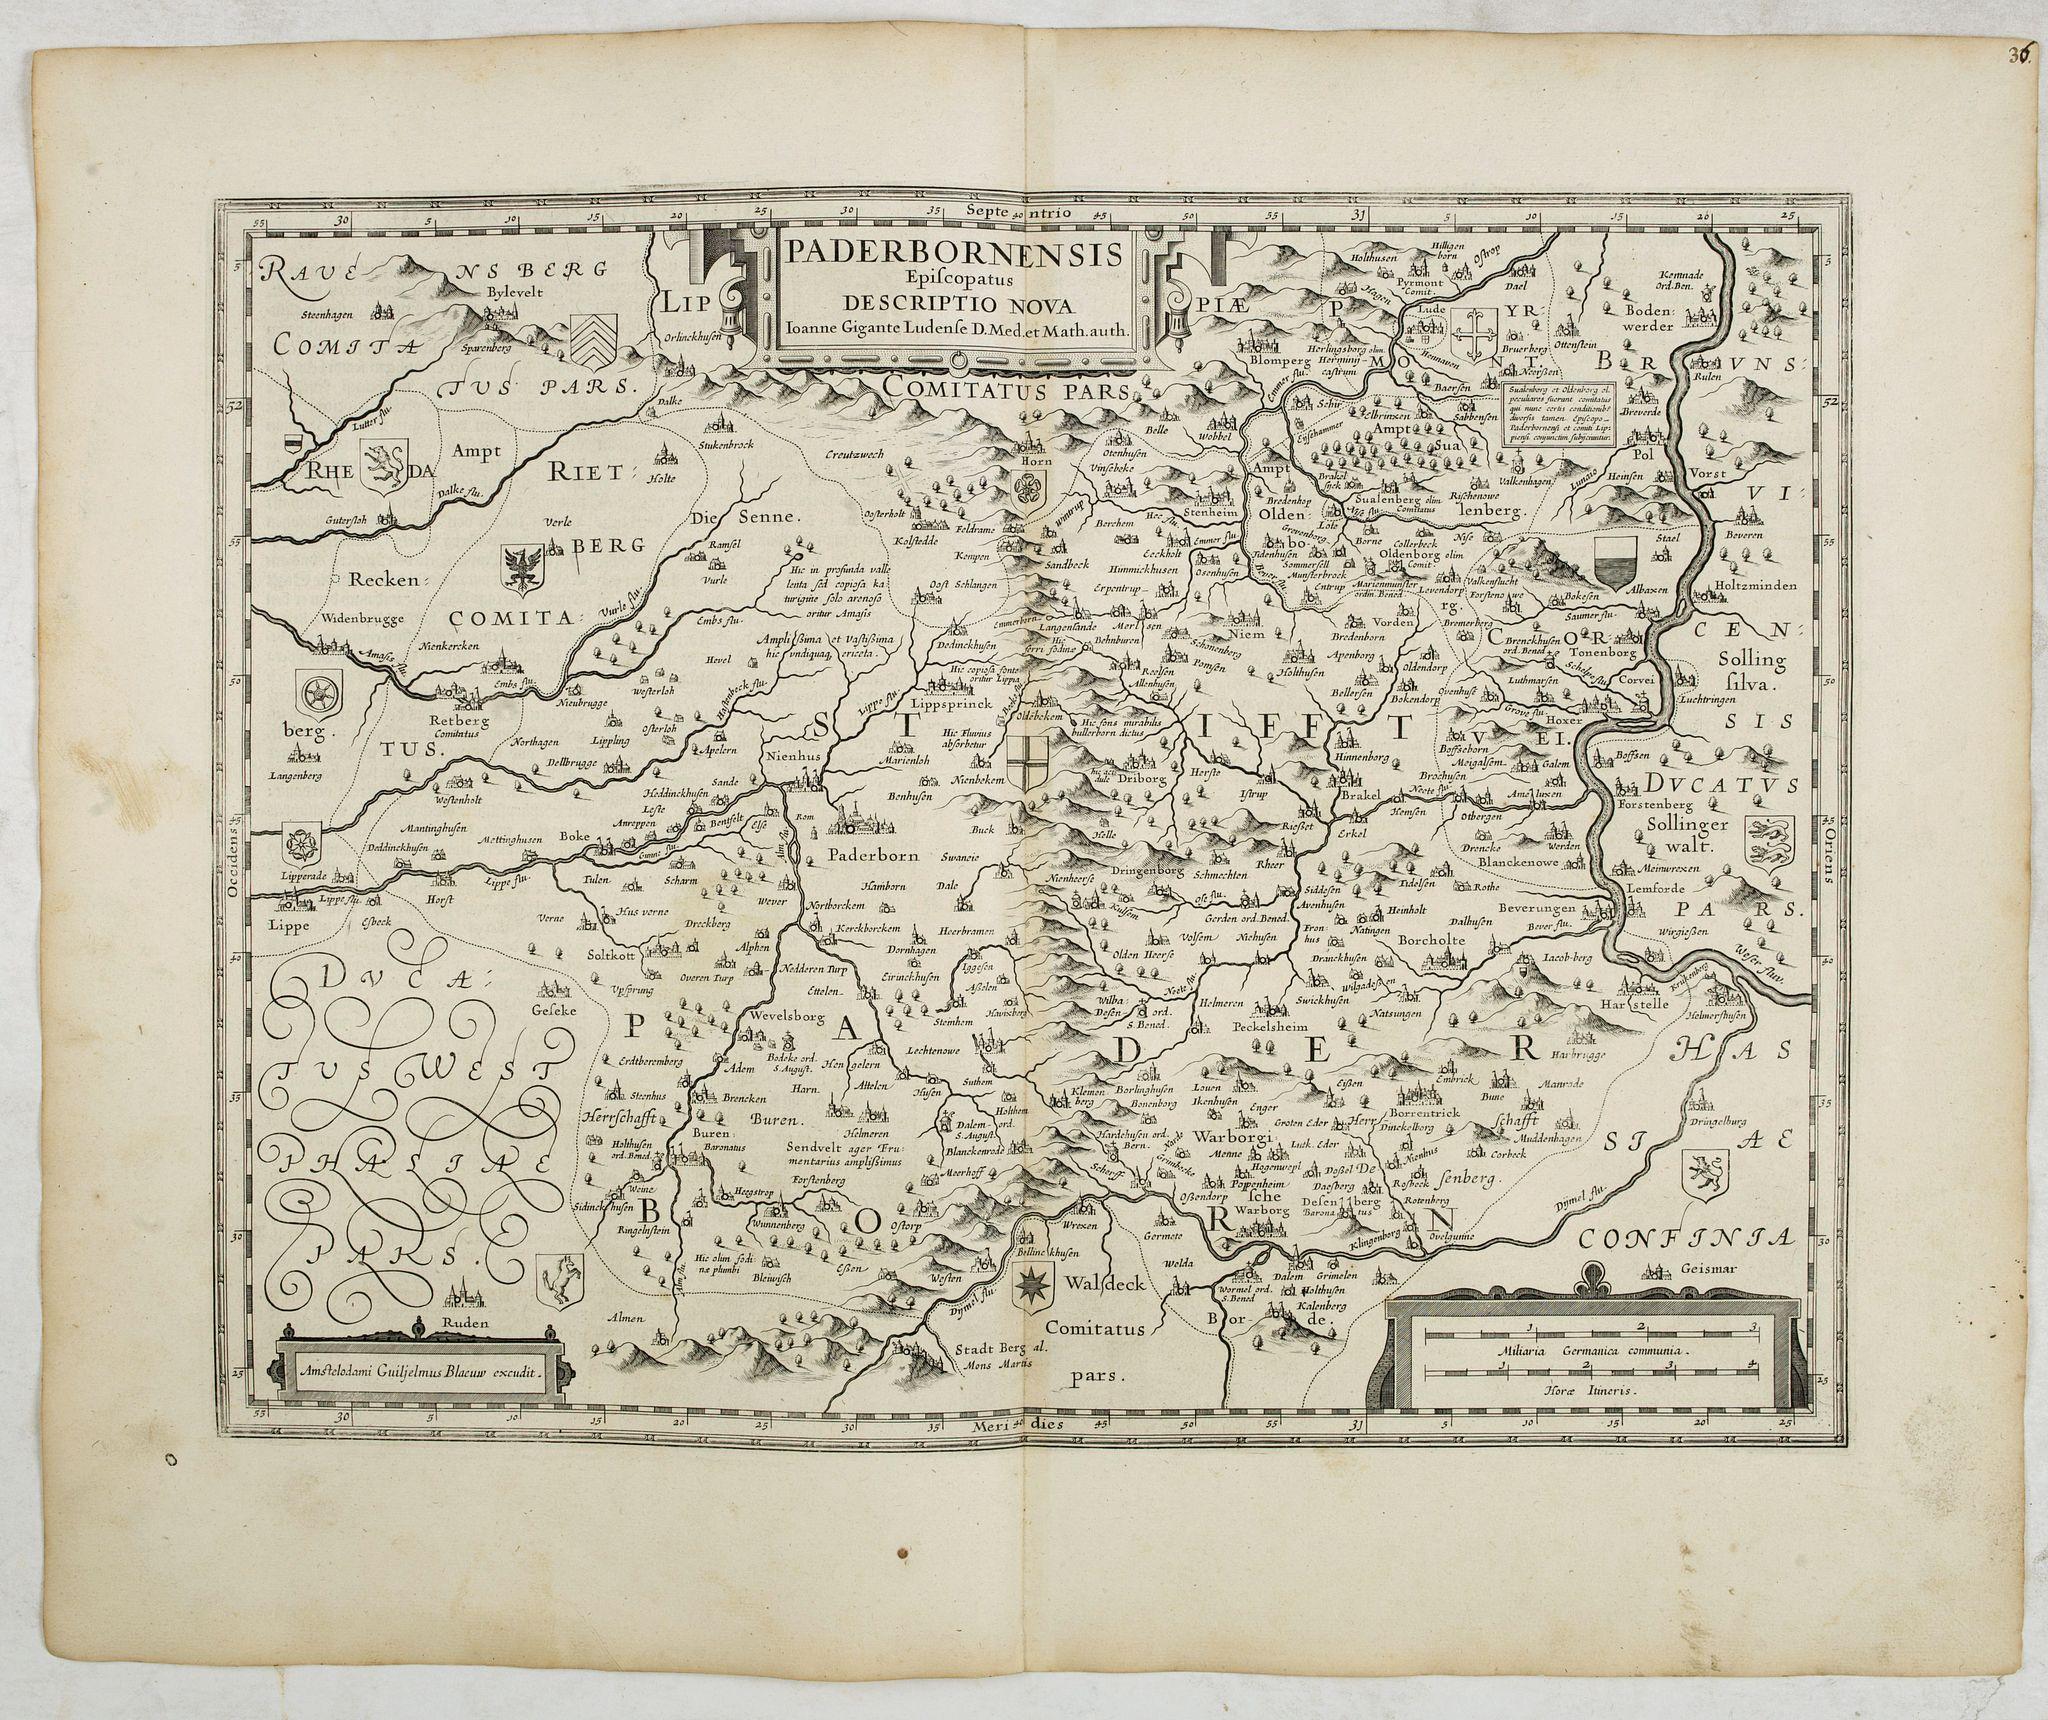 BLAEU, W. -  Paderbornensis Episcopatus Descriptio Nova.